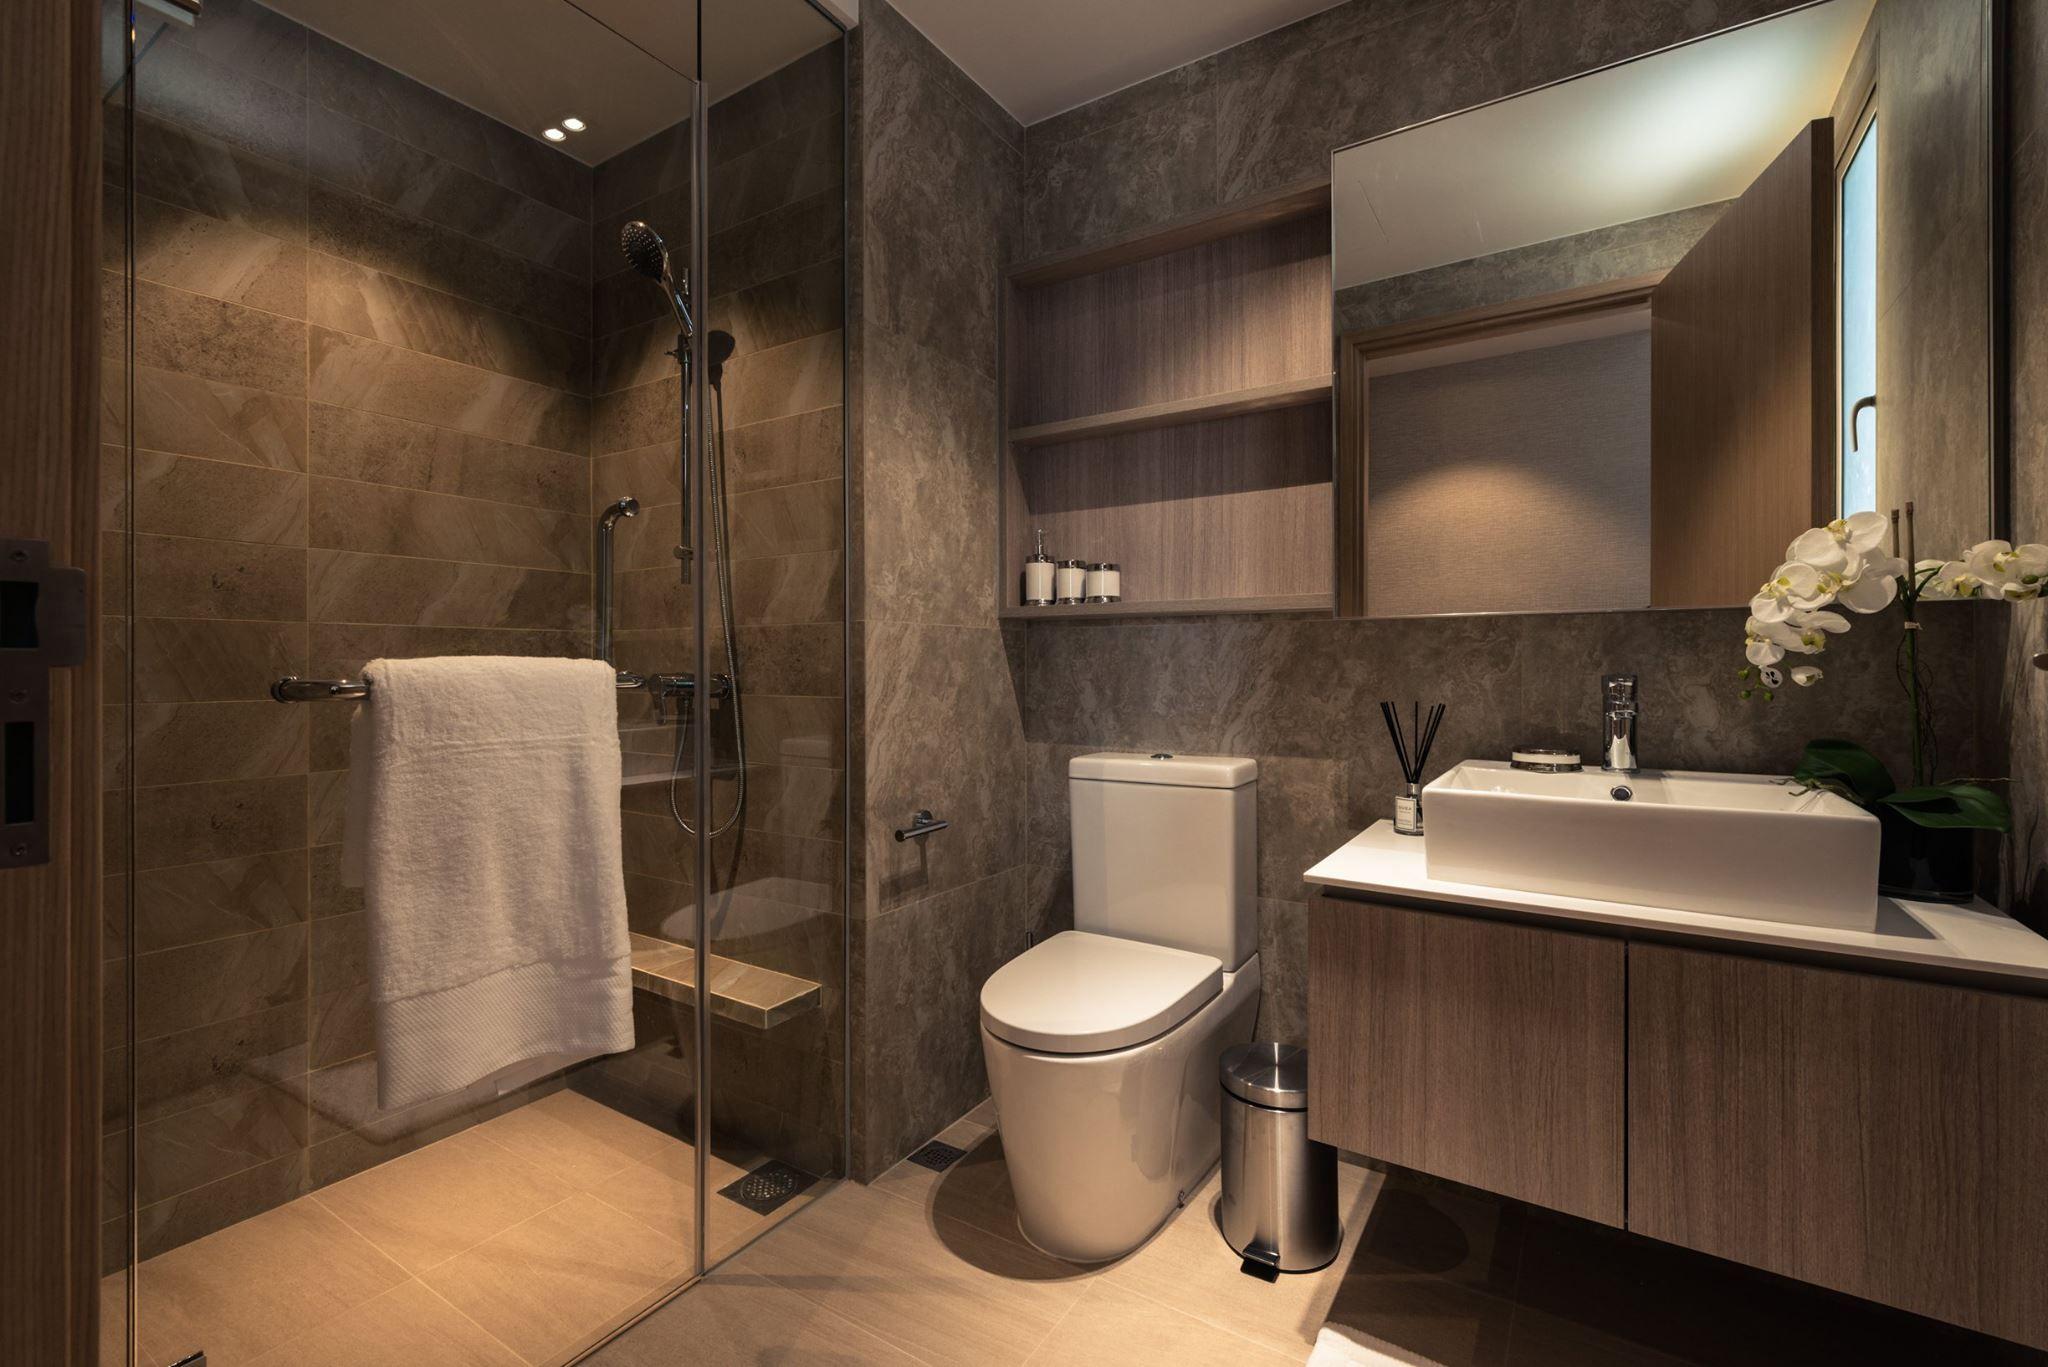 pinserene tay on a home bathroom  bathroom interior